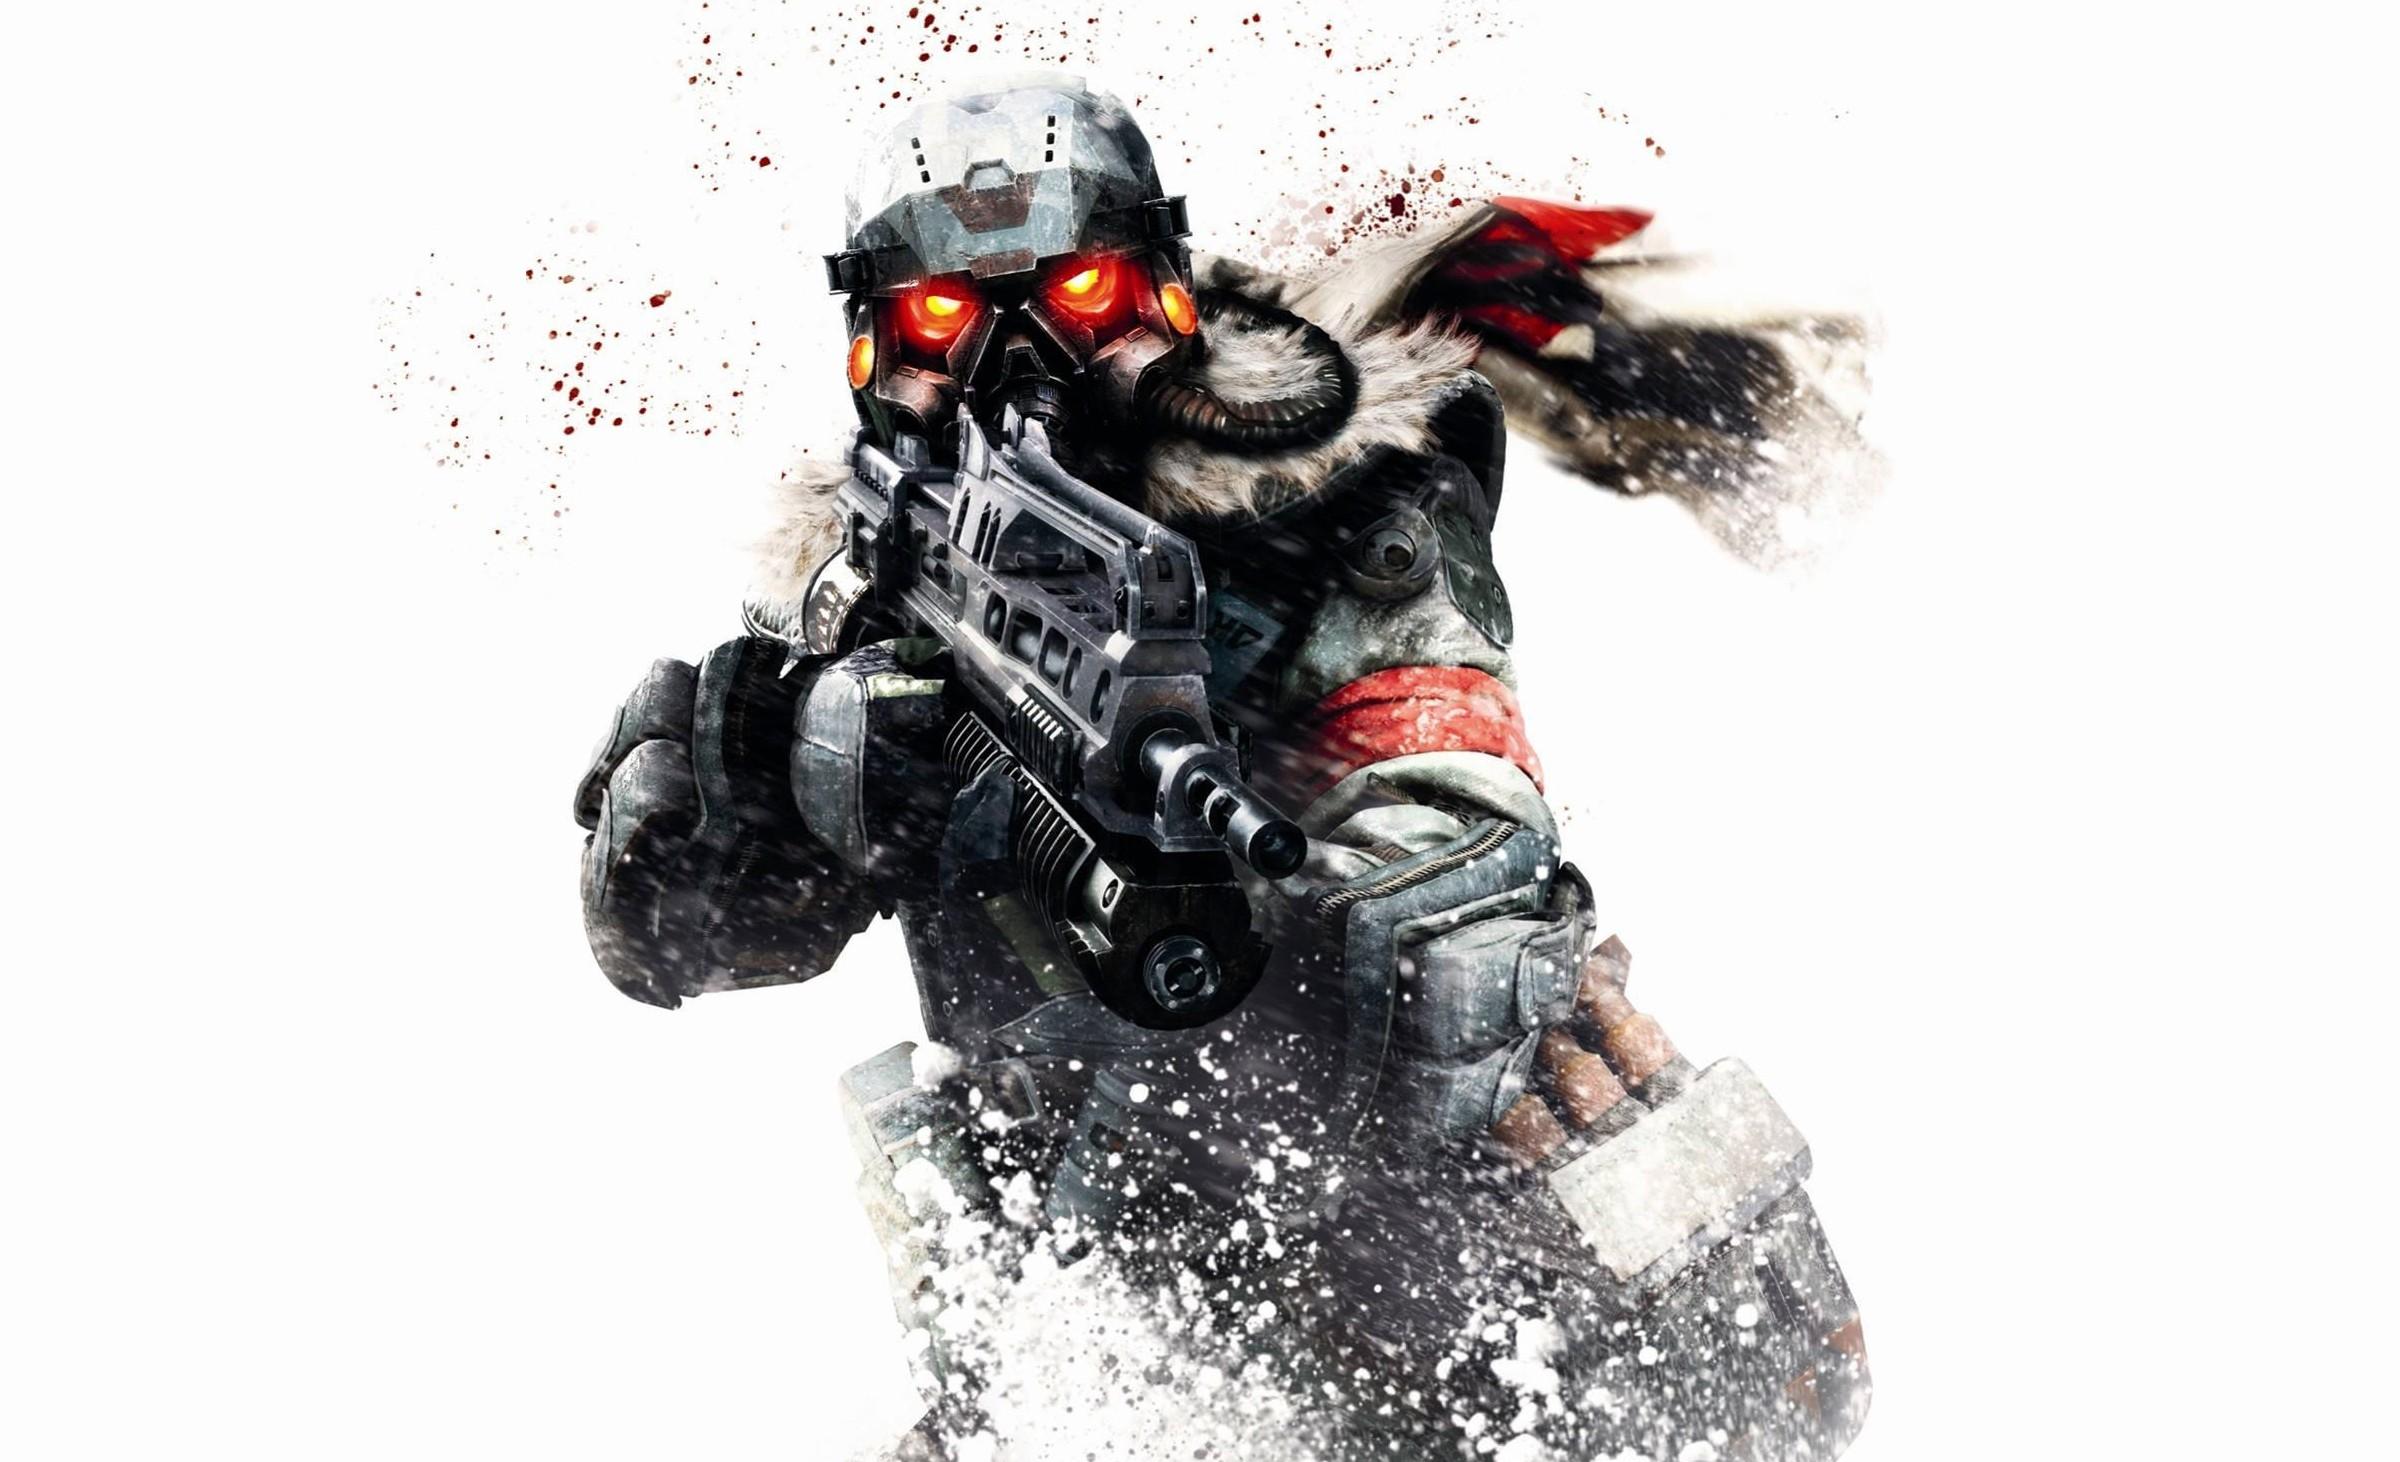 Killzone Shadow Fall Wallpaper 1080p Killzone Warrior Soldier Sci Fi Weapon Gun Gas Mask G